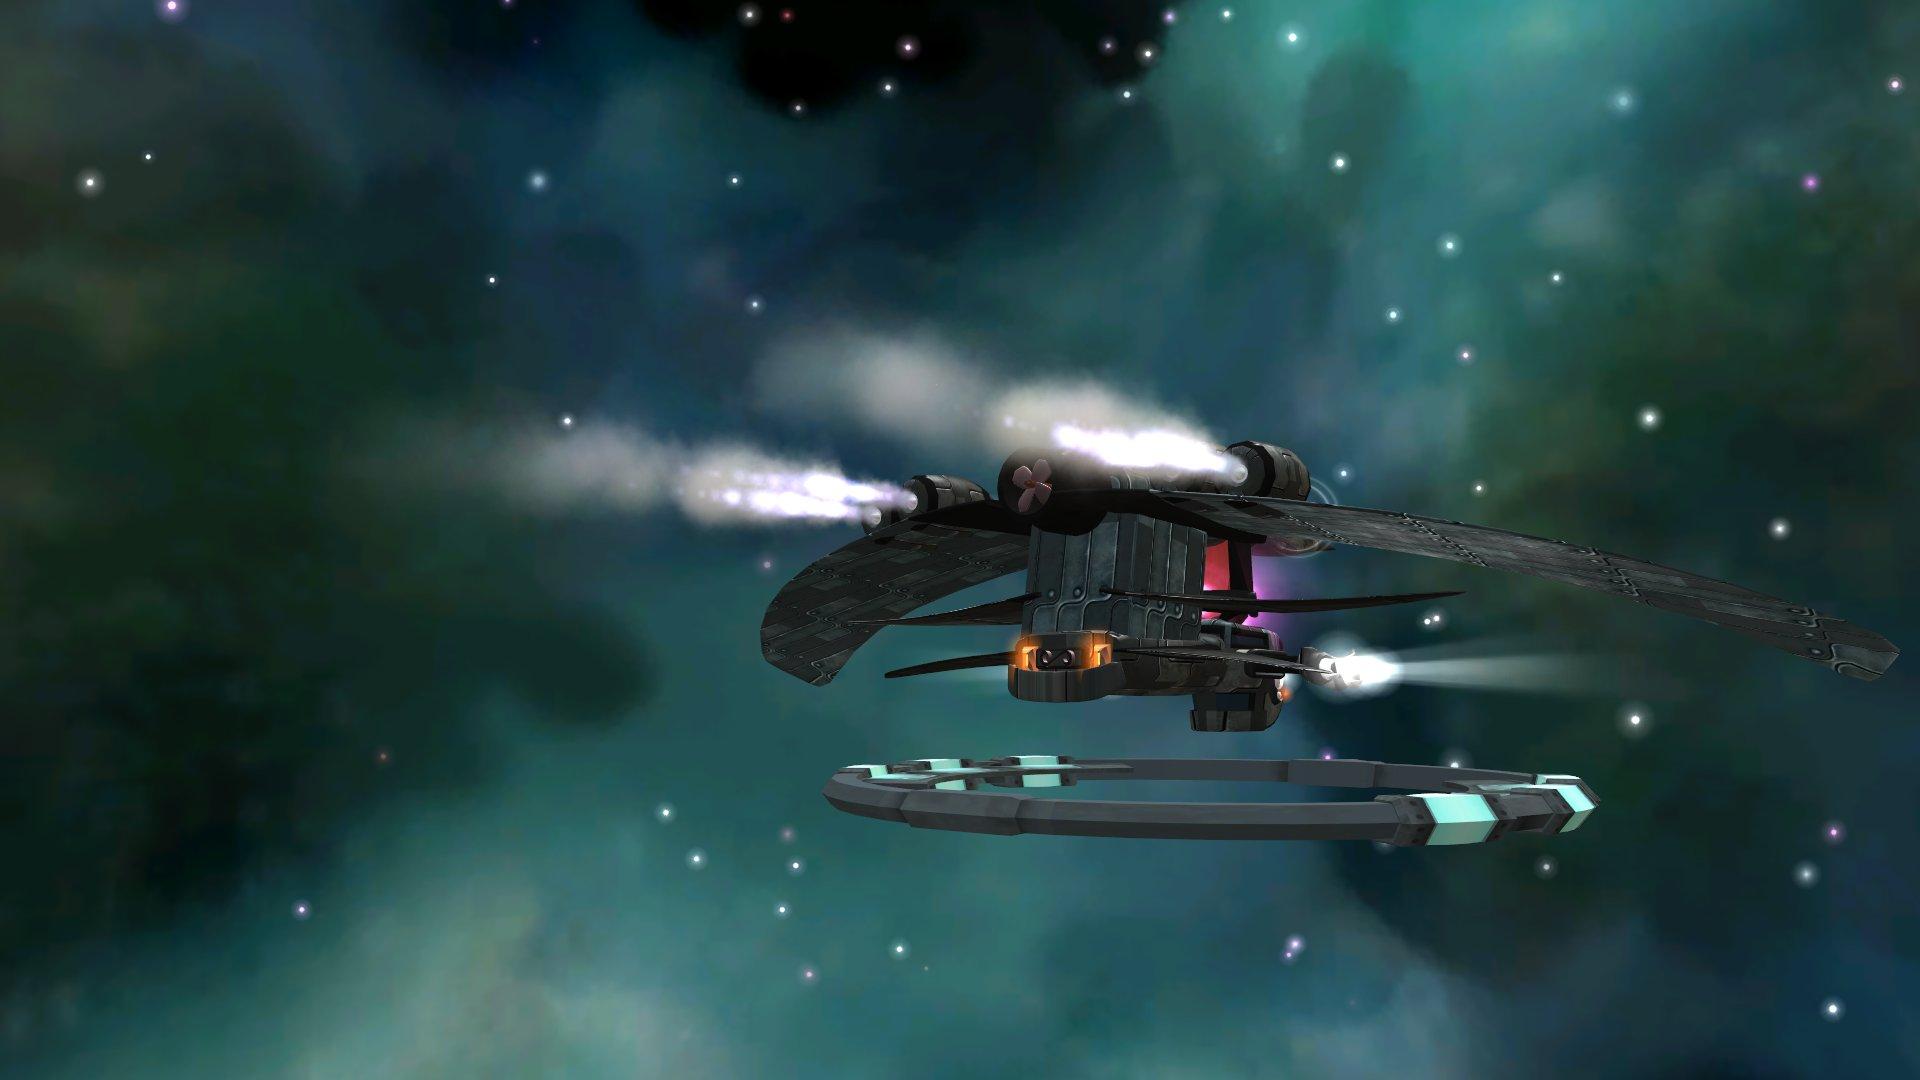 (21) Naves del imperio Neimerer URXhqyM